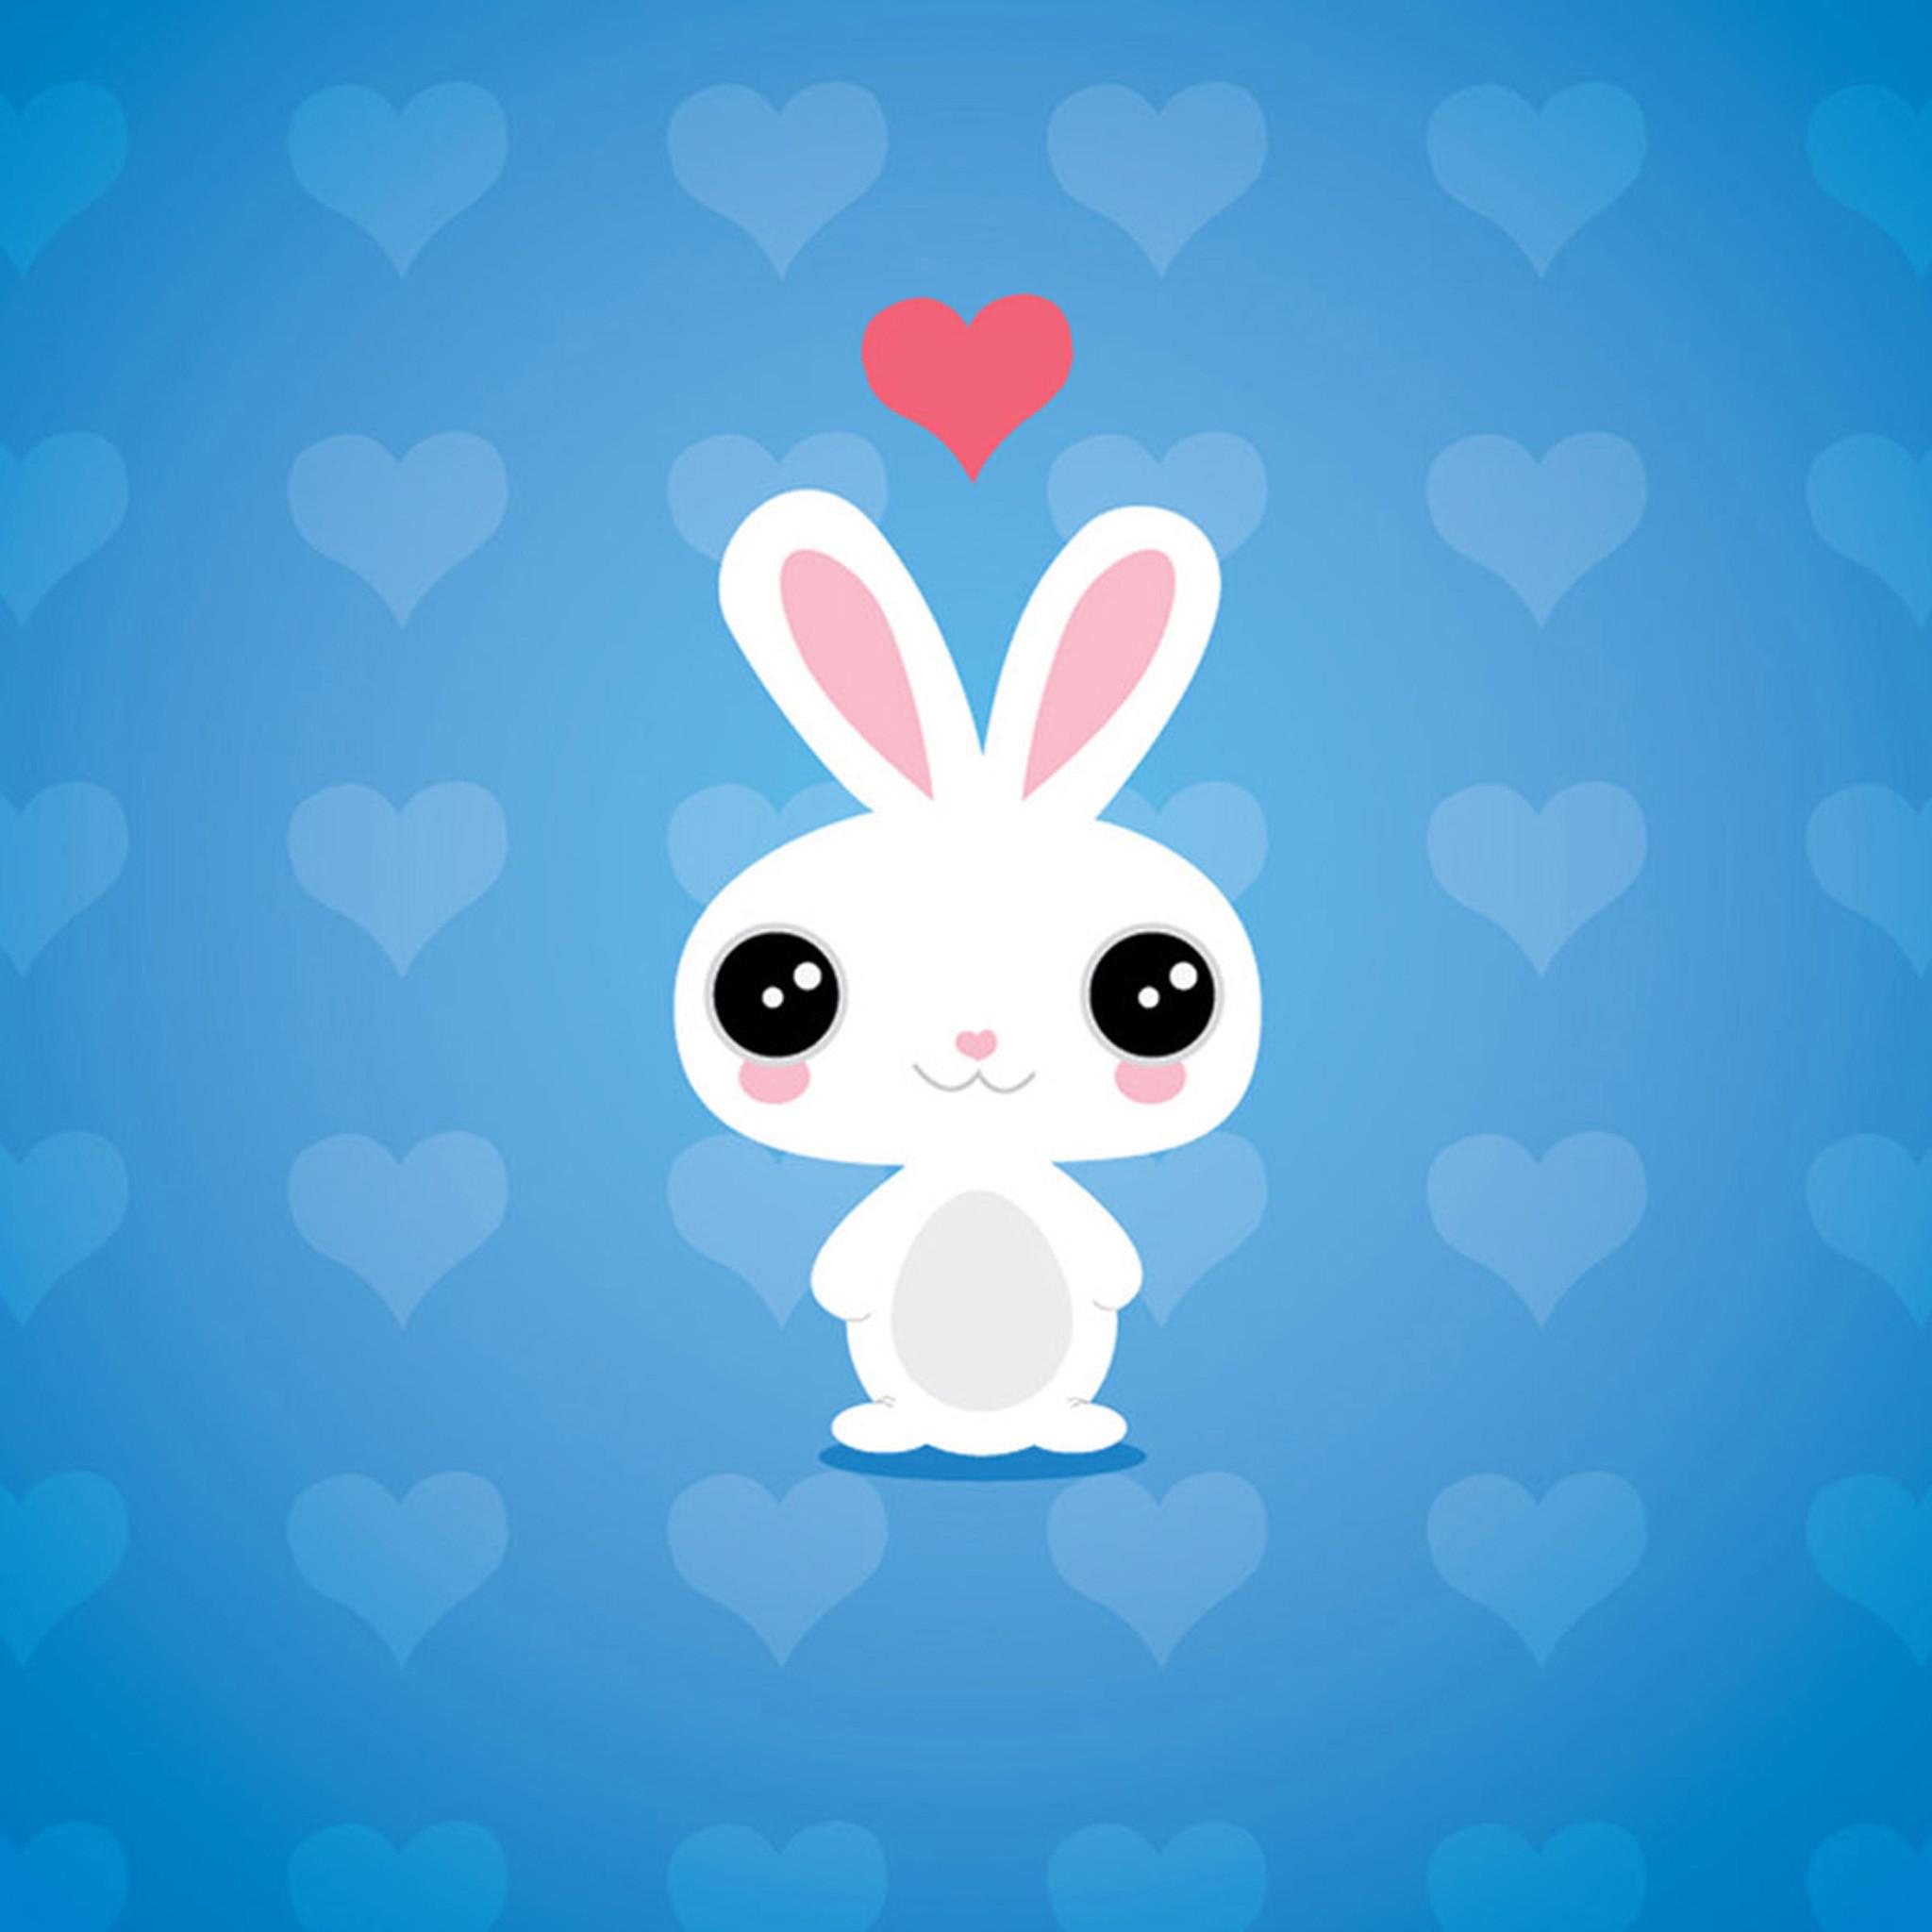 Cute Cartoon Character Wallpaper (61+ Images